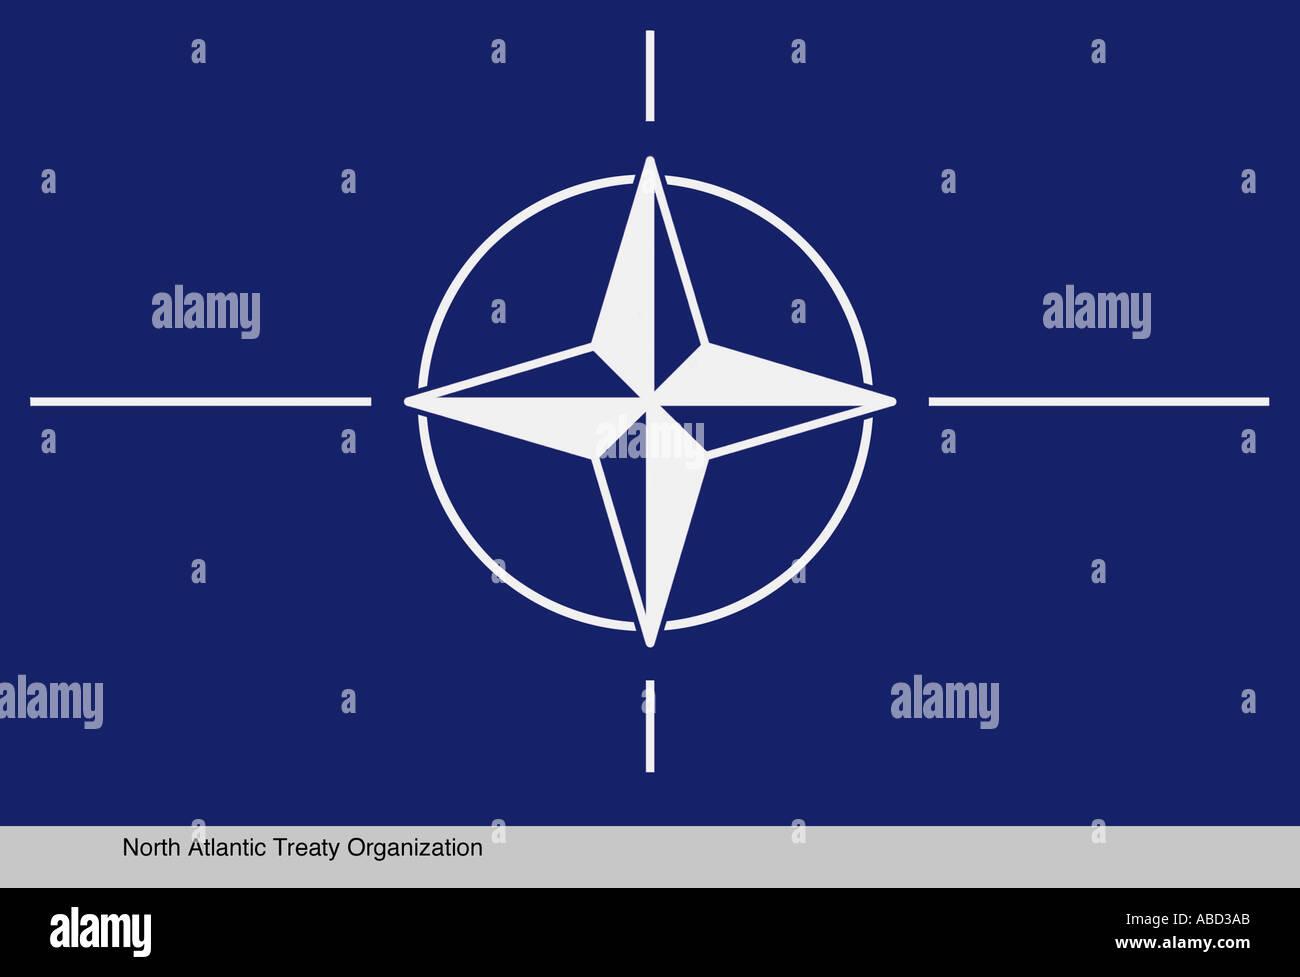 North Atlantic Treaty Organization - Stock Image